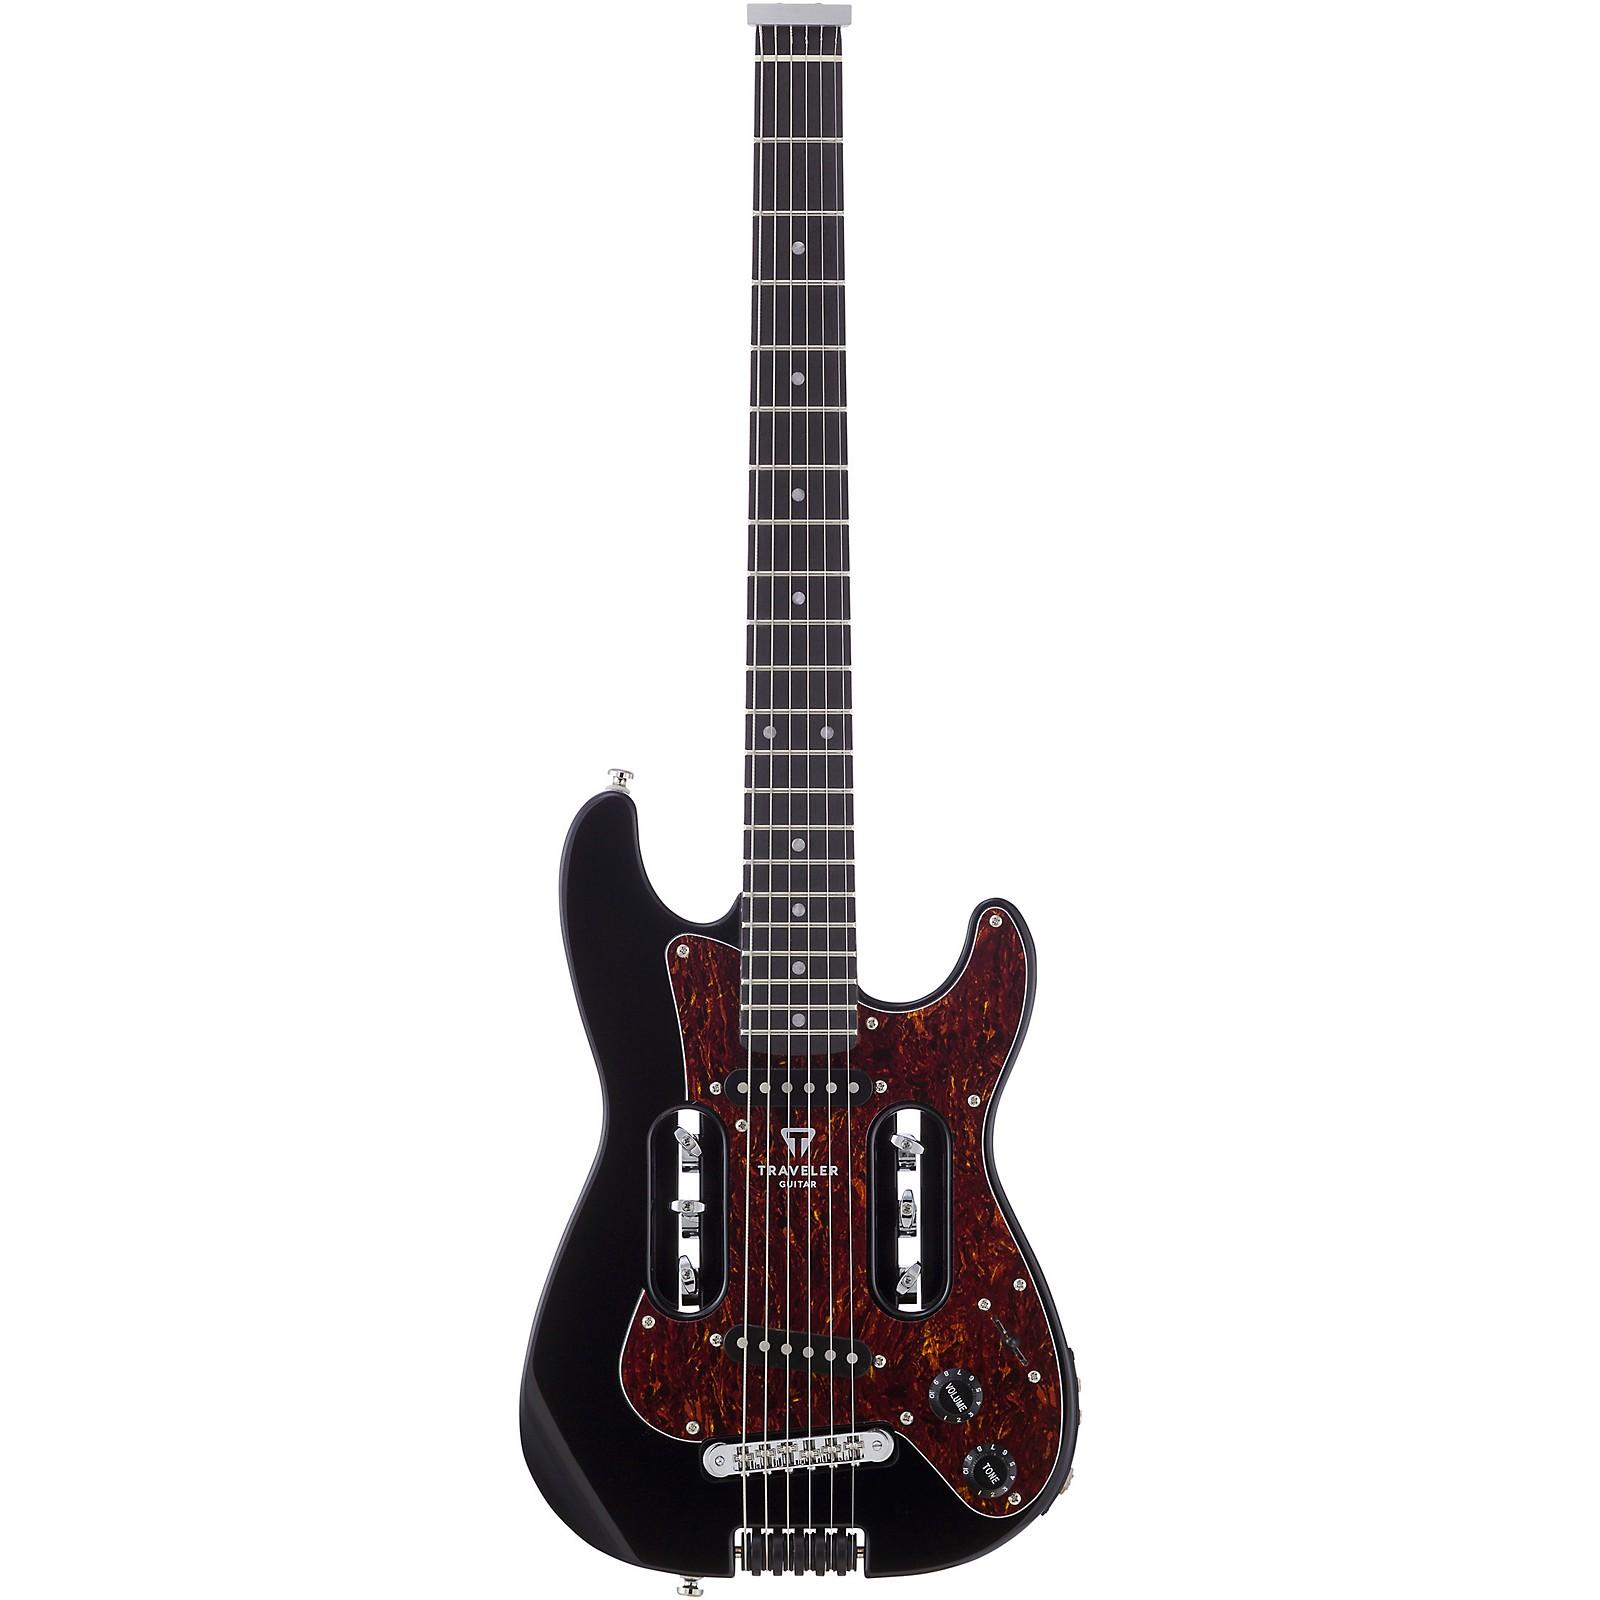 Open Box Traveler Guitar EG-2 Standard Electric Travel Guitar with Deluxe Gig Bag